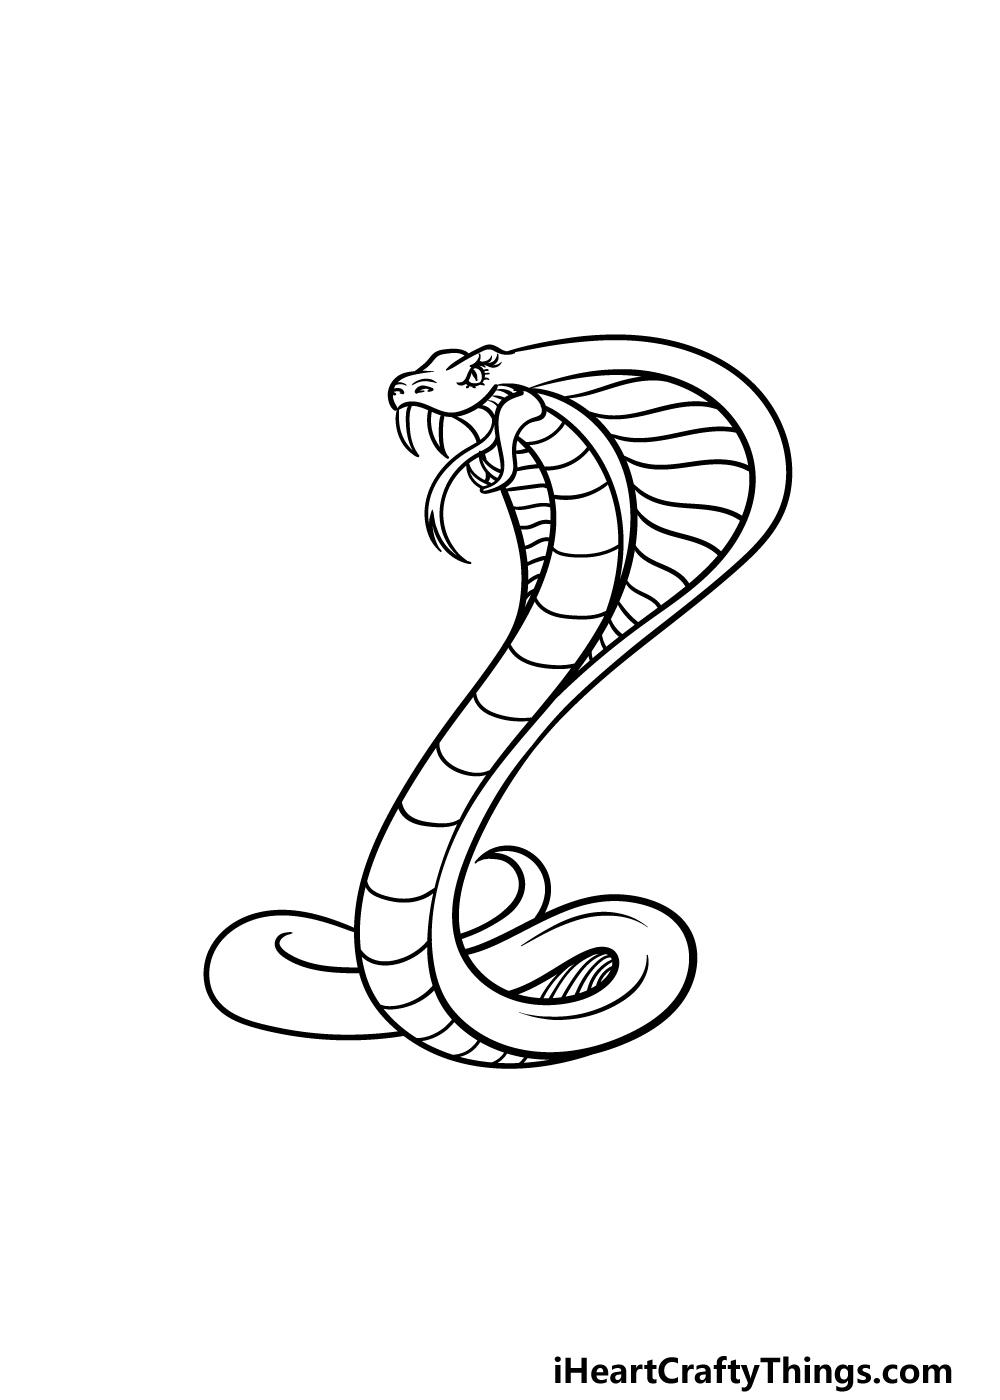 drawing cobra step 4